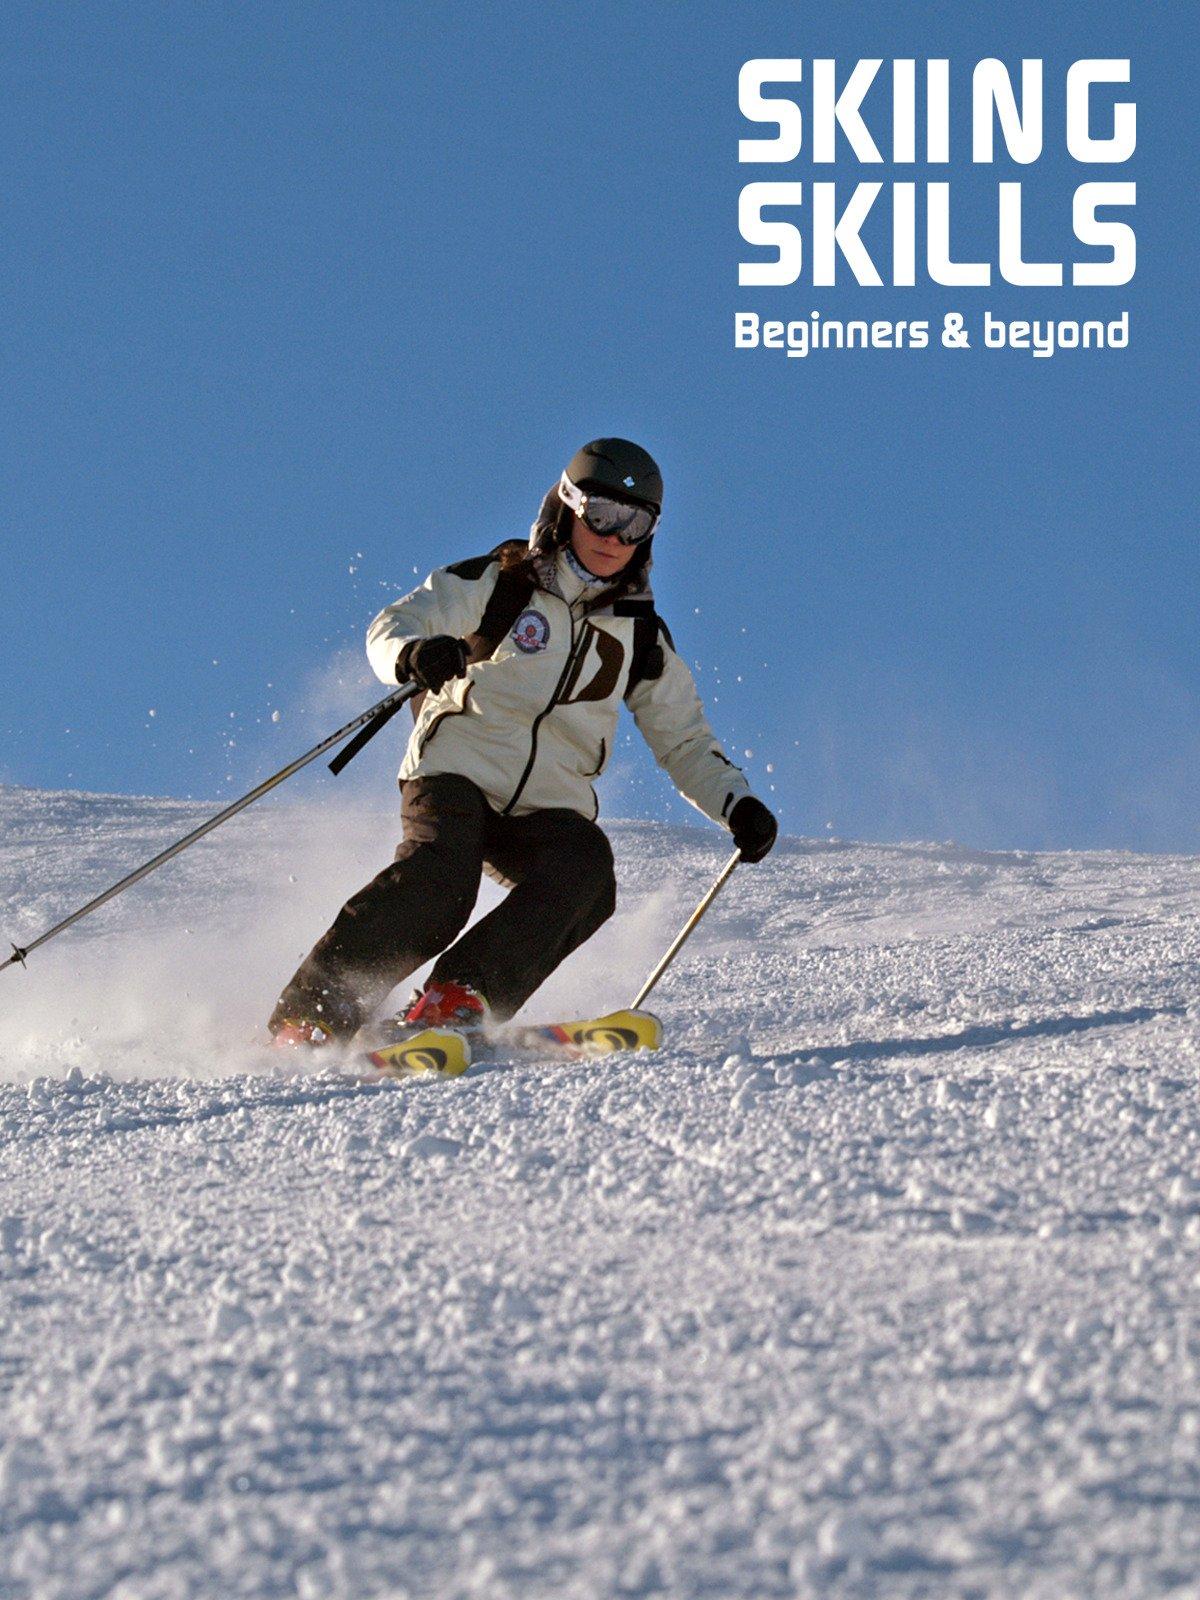 Skiing Skills - Beginners and Beyond on Amazon Prime Video UK